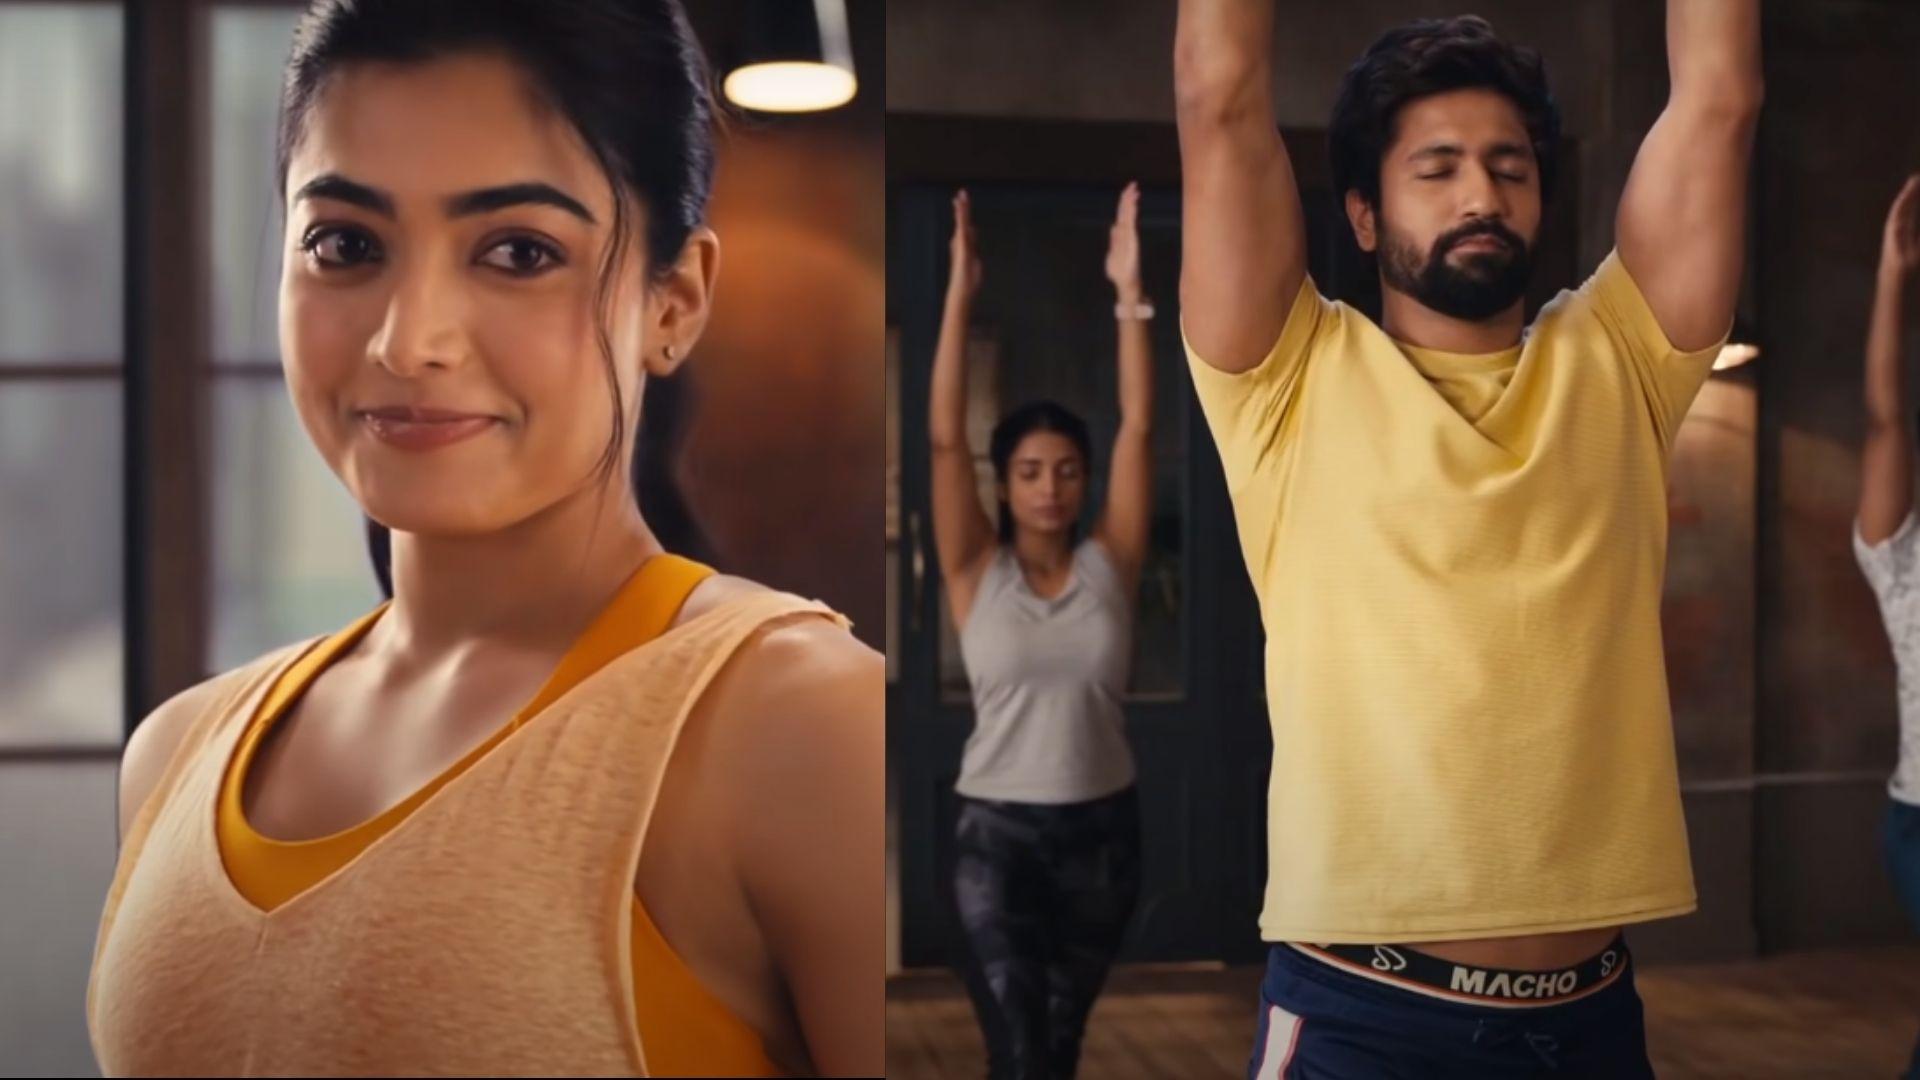 Rashmika Mandanna Gets Trolled For Gawking At Vicky Kaushal's Underwear Strap In An Ad